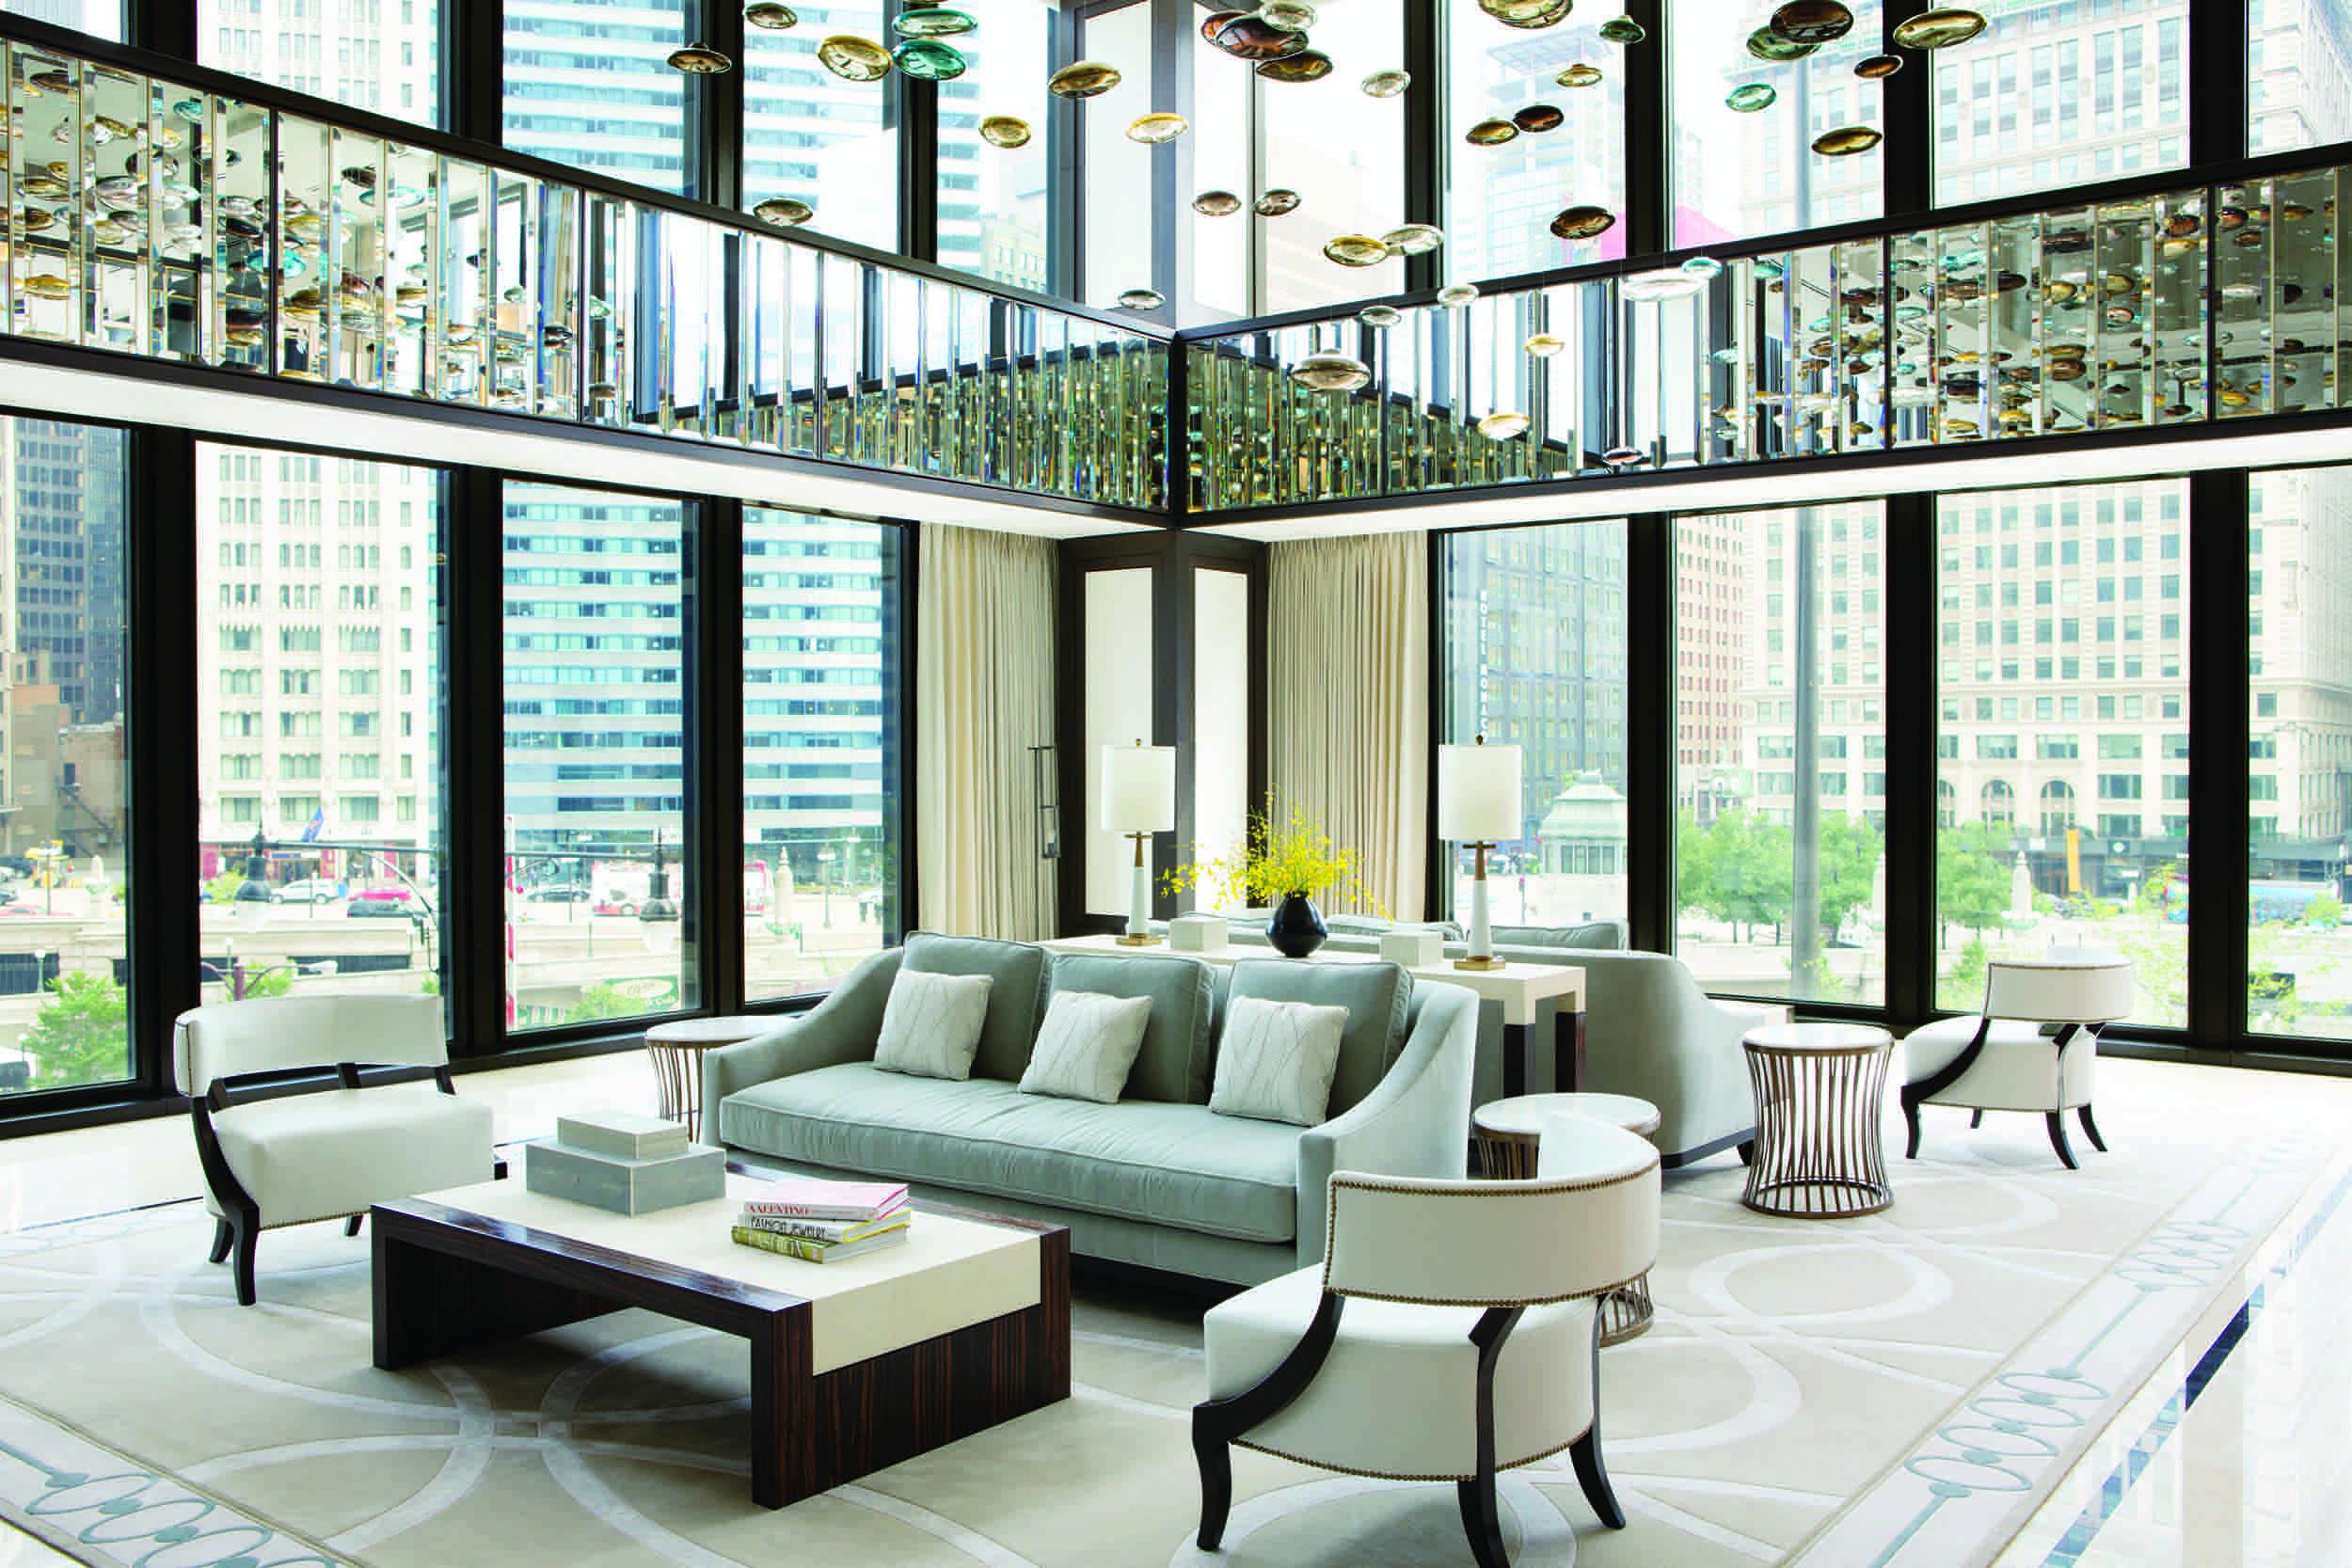 Langham_lobby_hotellounge.jpg